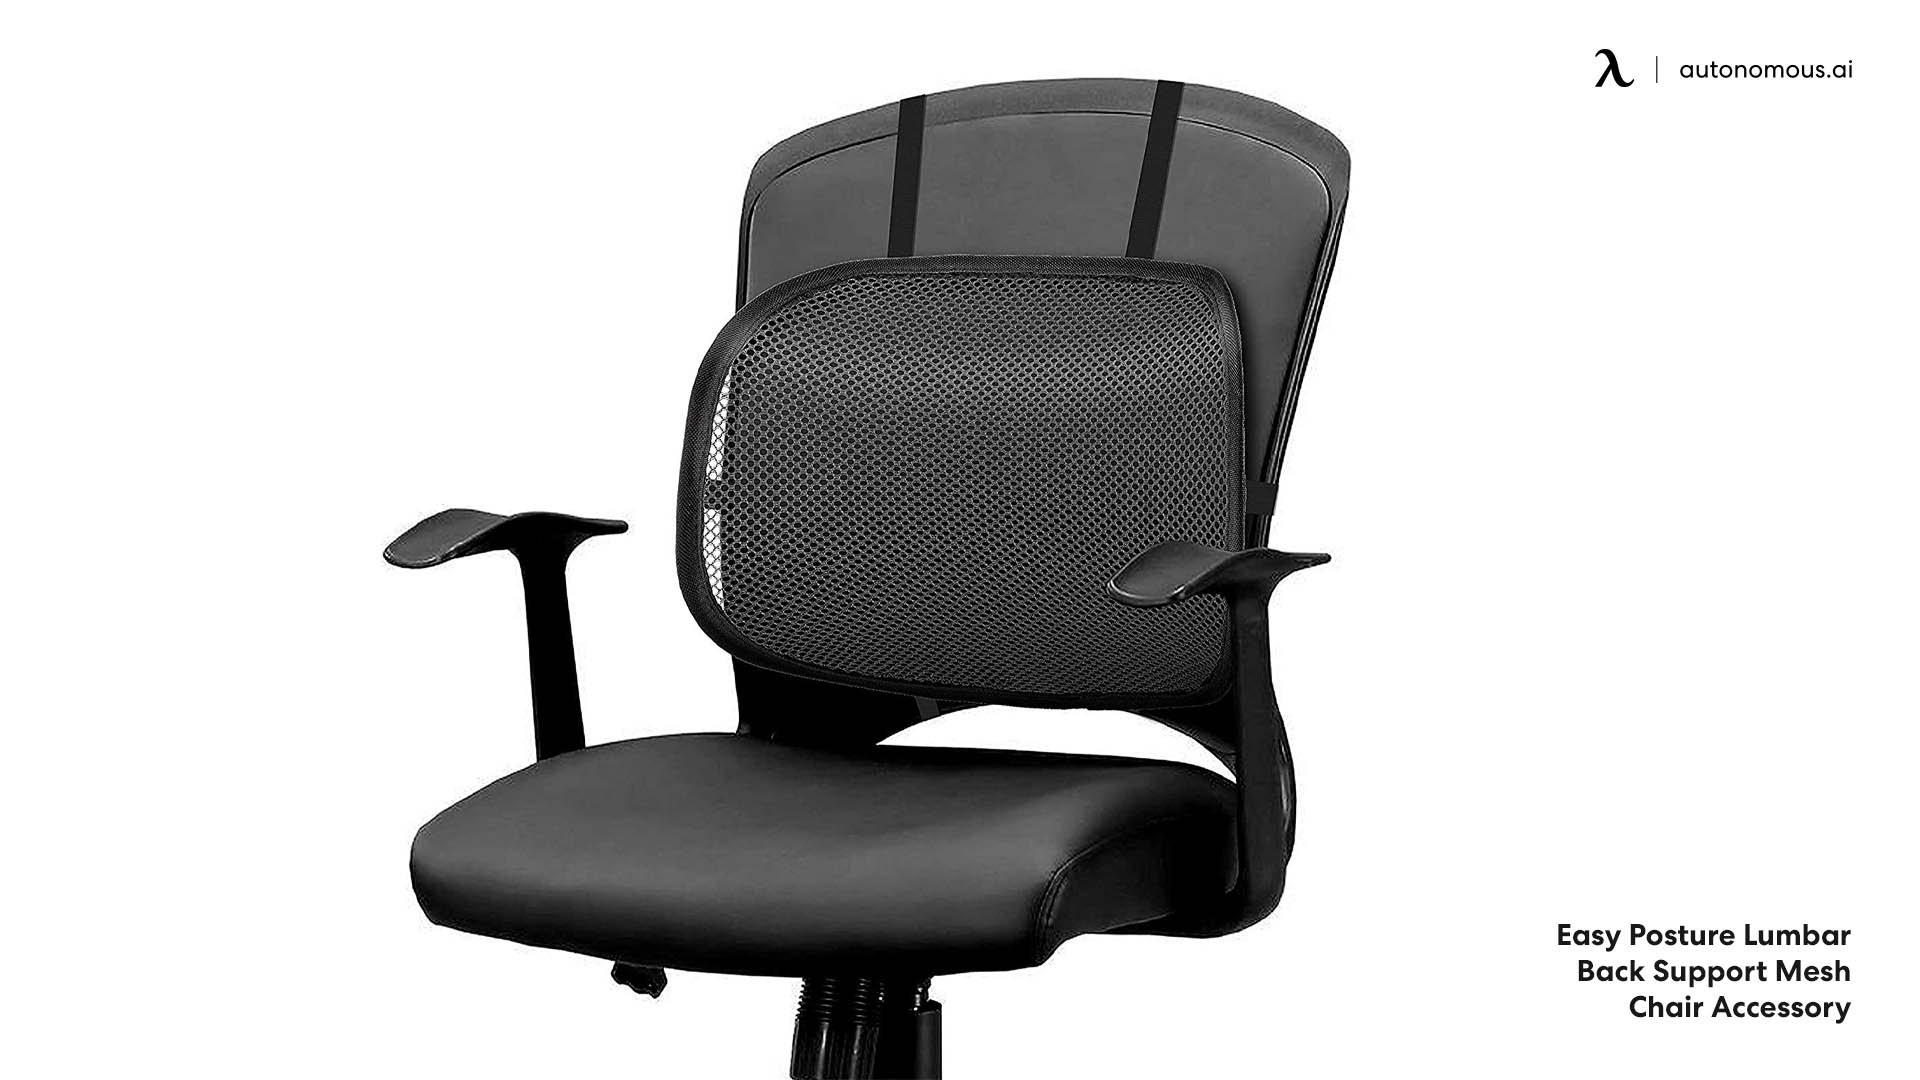 Mesh Chair Accesory